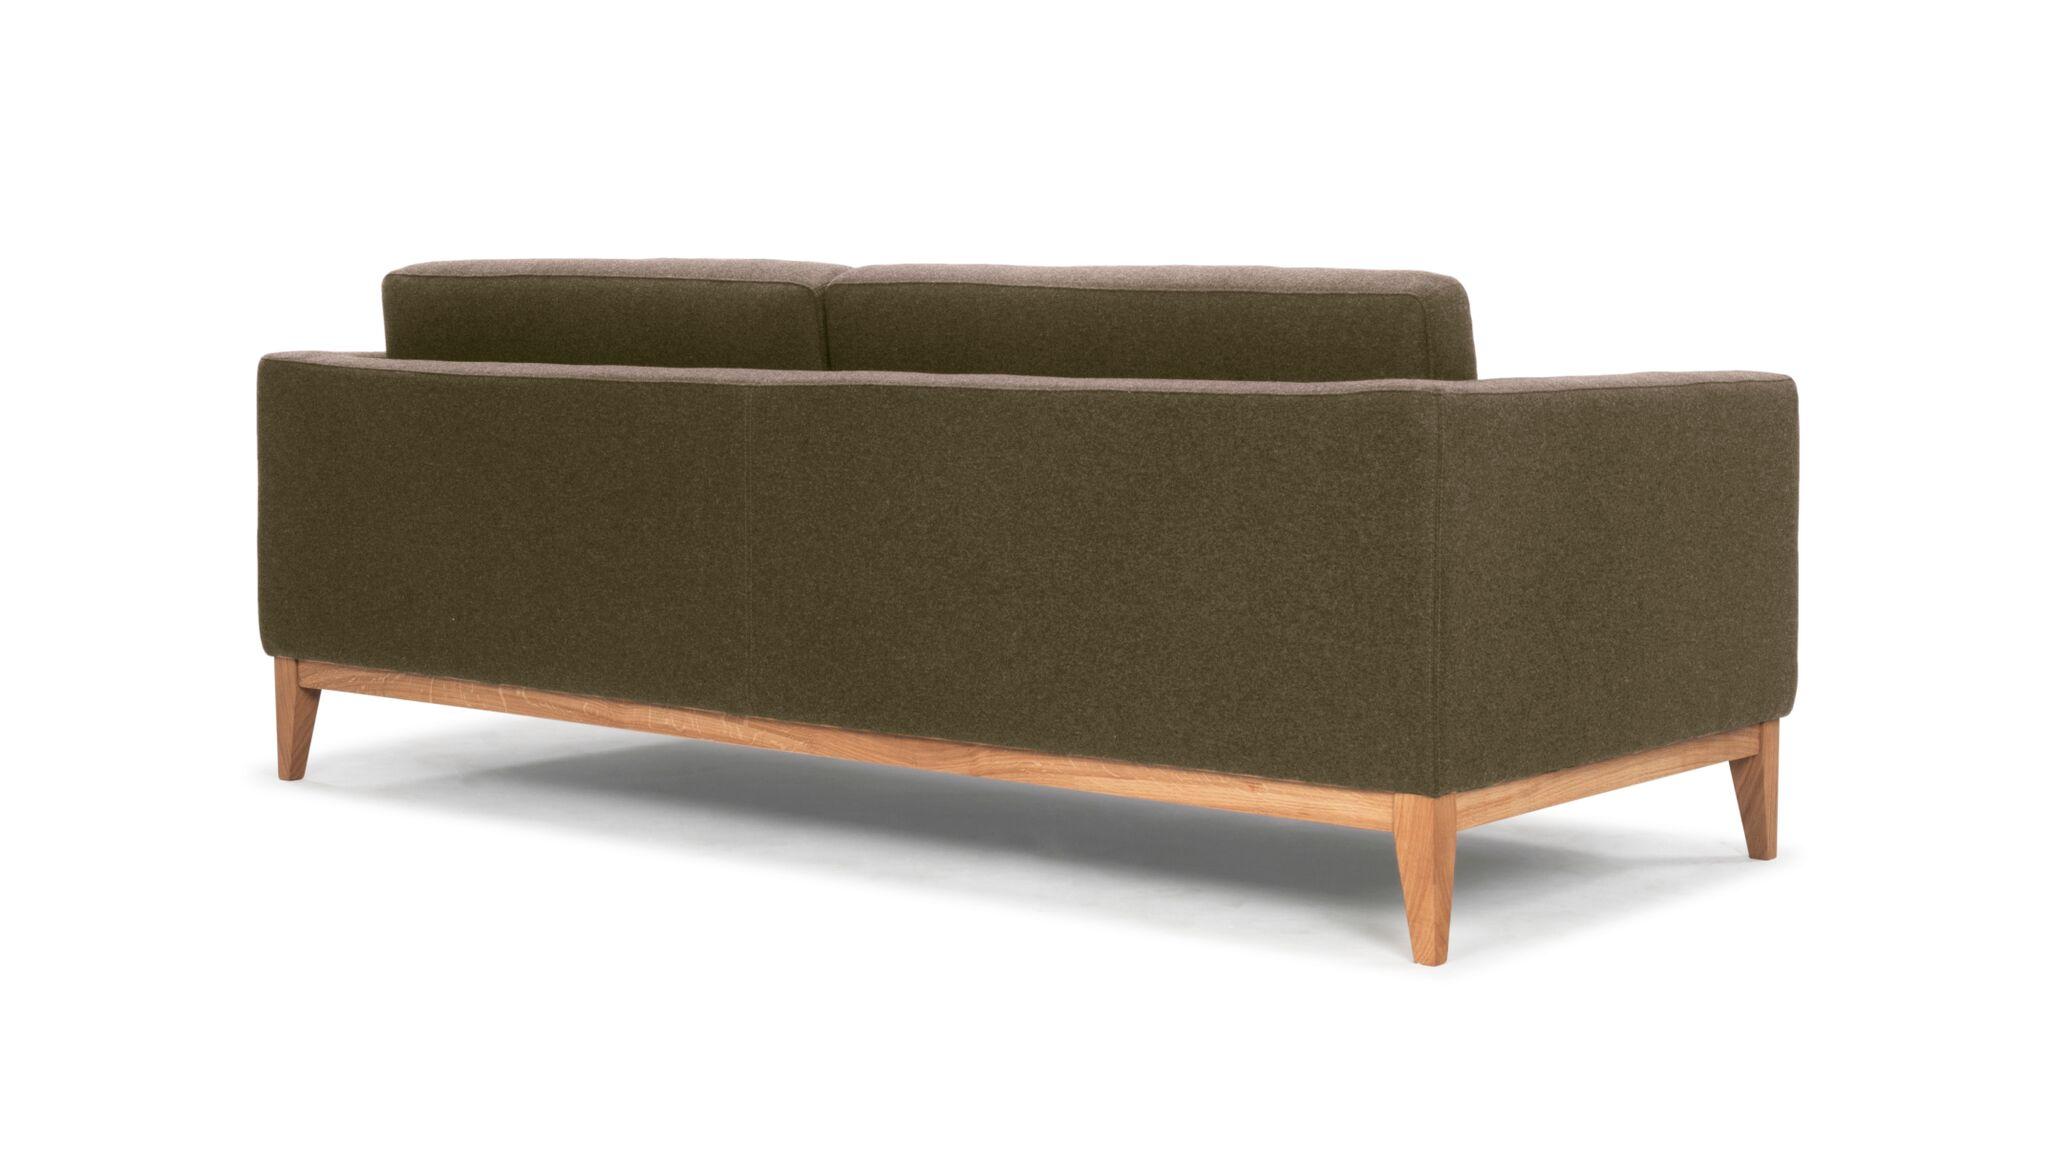 Schön Kleines L Sofa Beste Wahl Design E Stockholm Day Army Melange